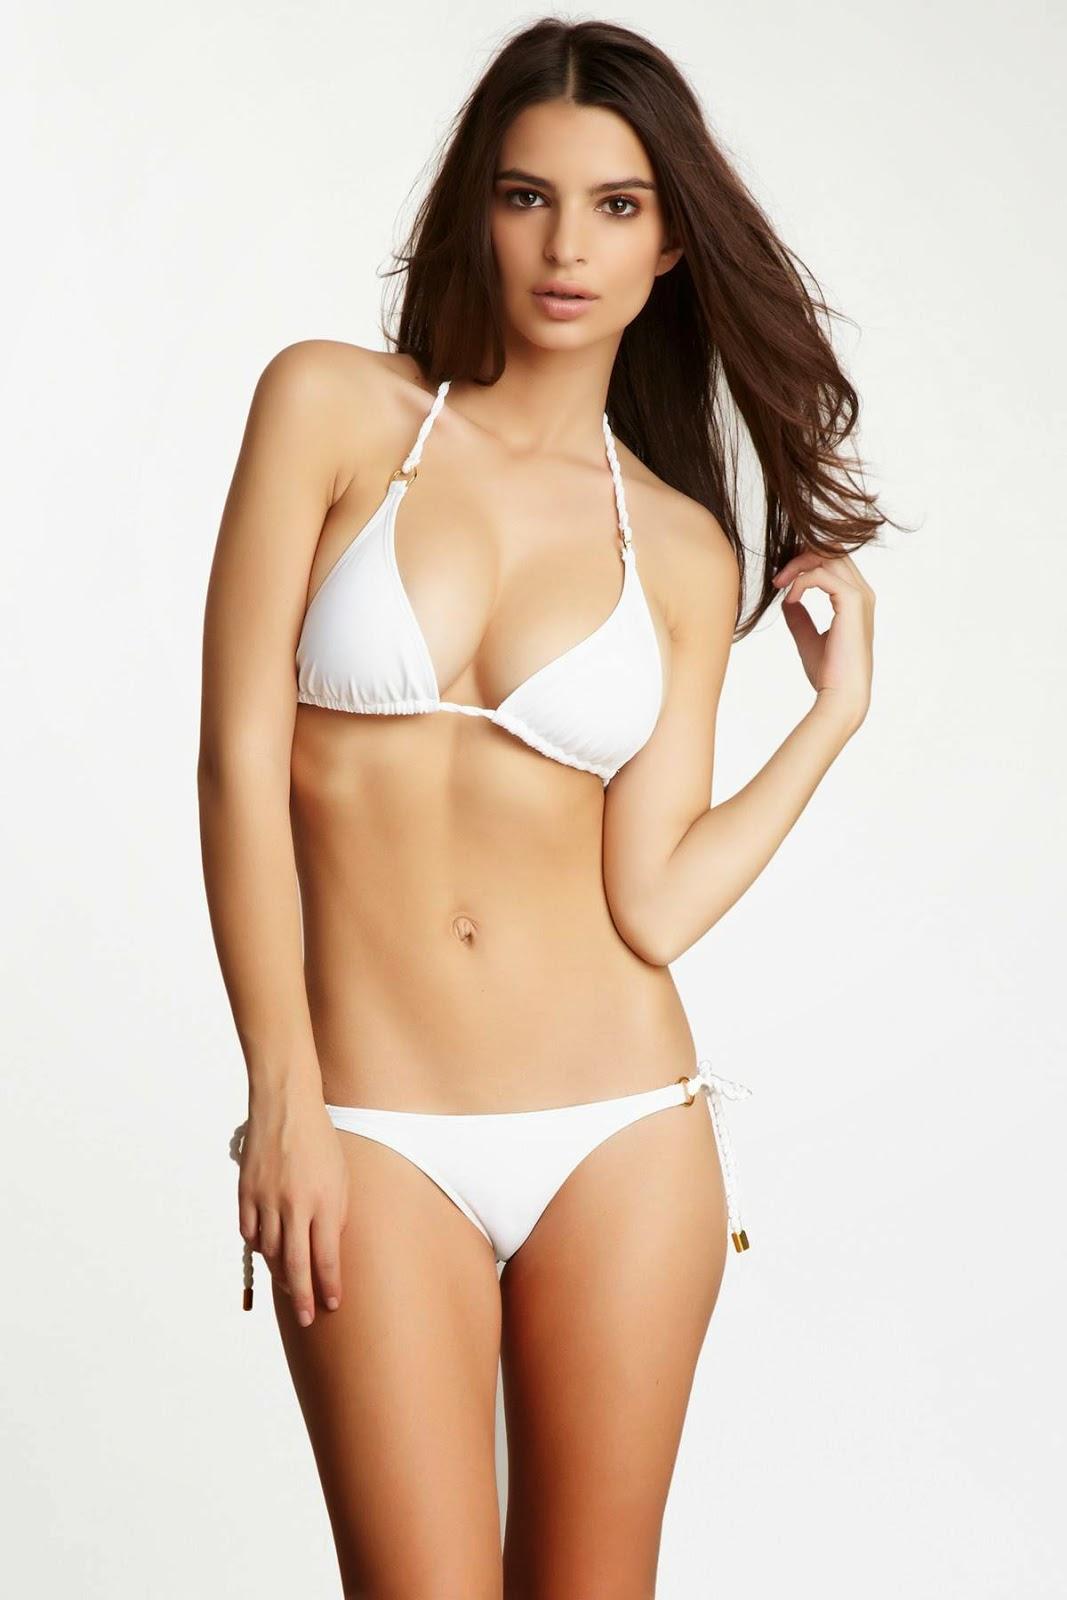 Bikini Hq 24